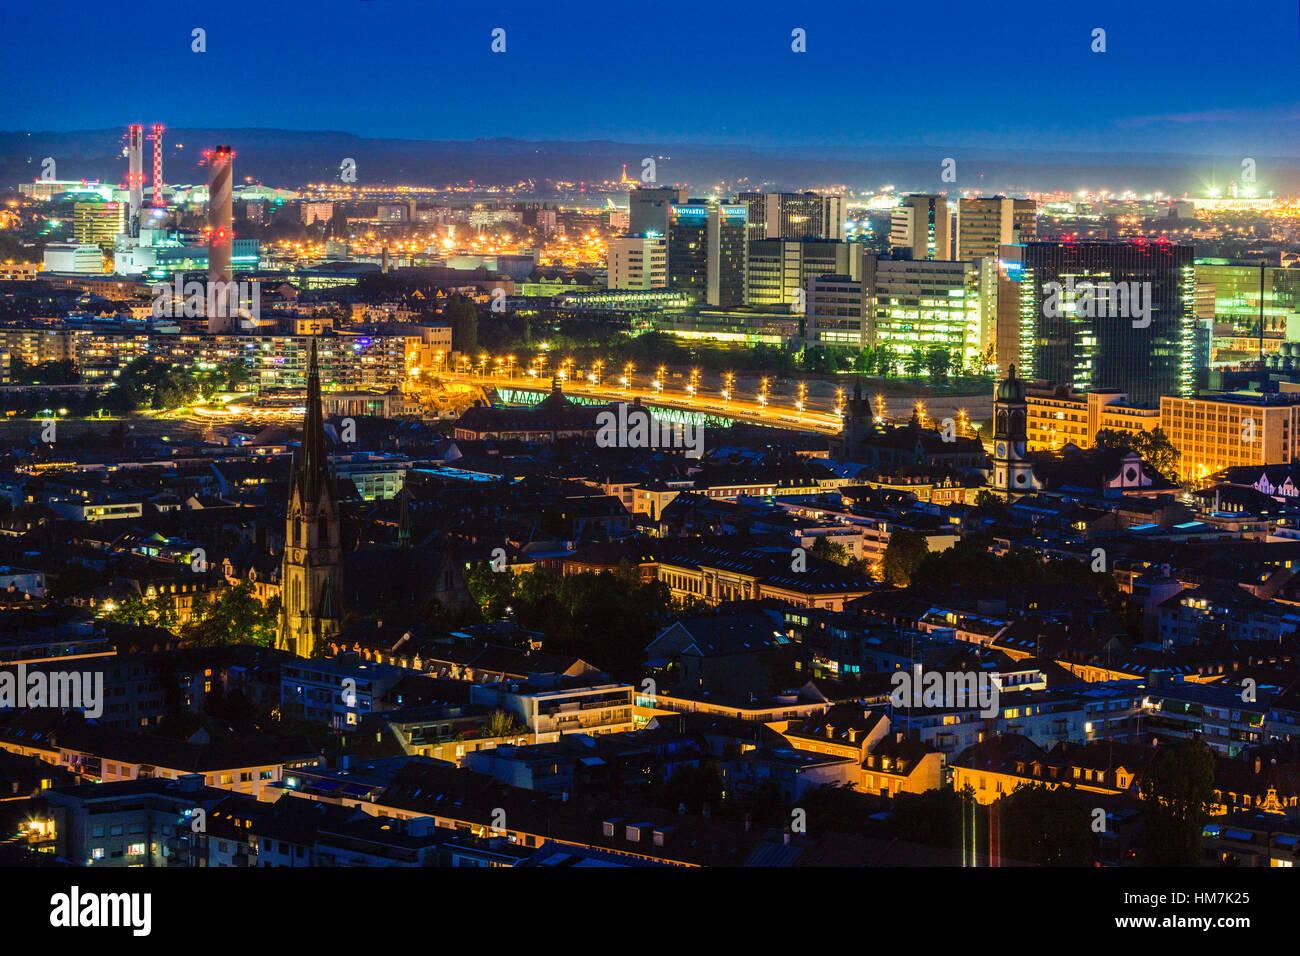 Switzerland, Basel, Basel-Stadt, Cityscape at night - Stock Image